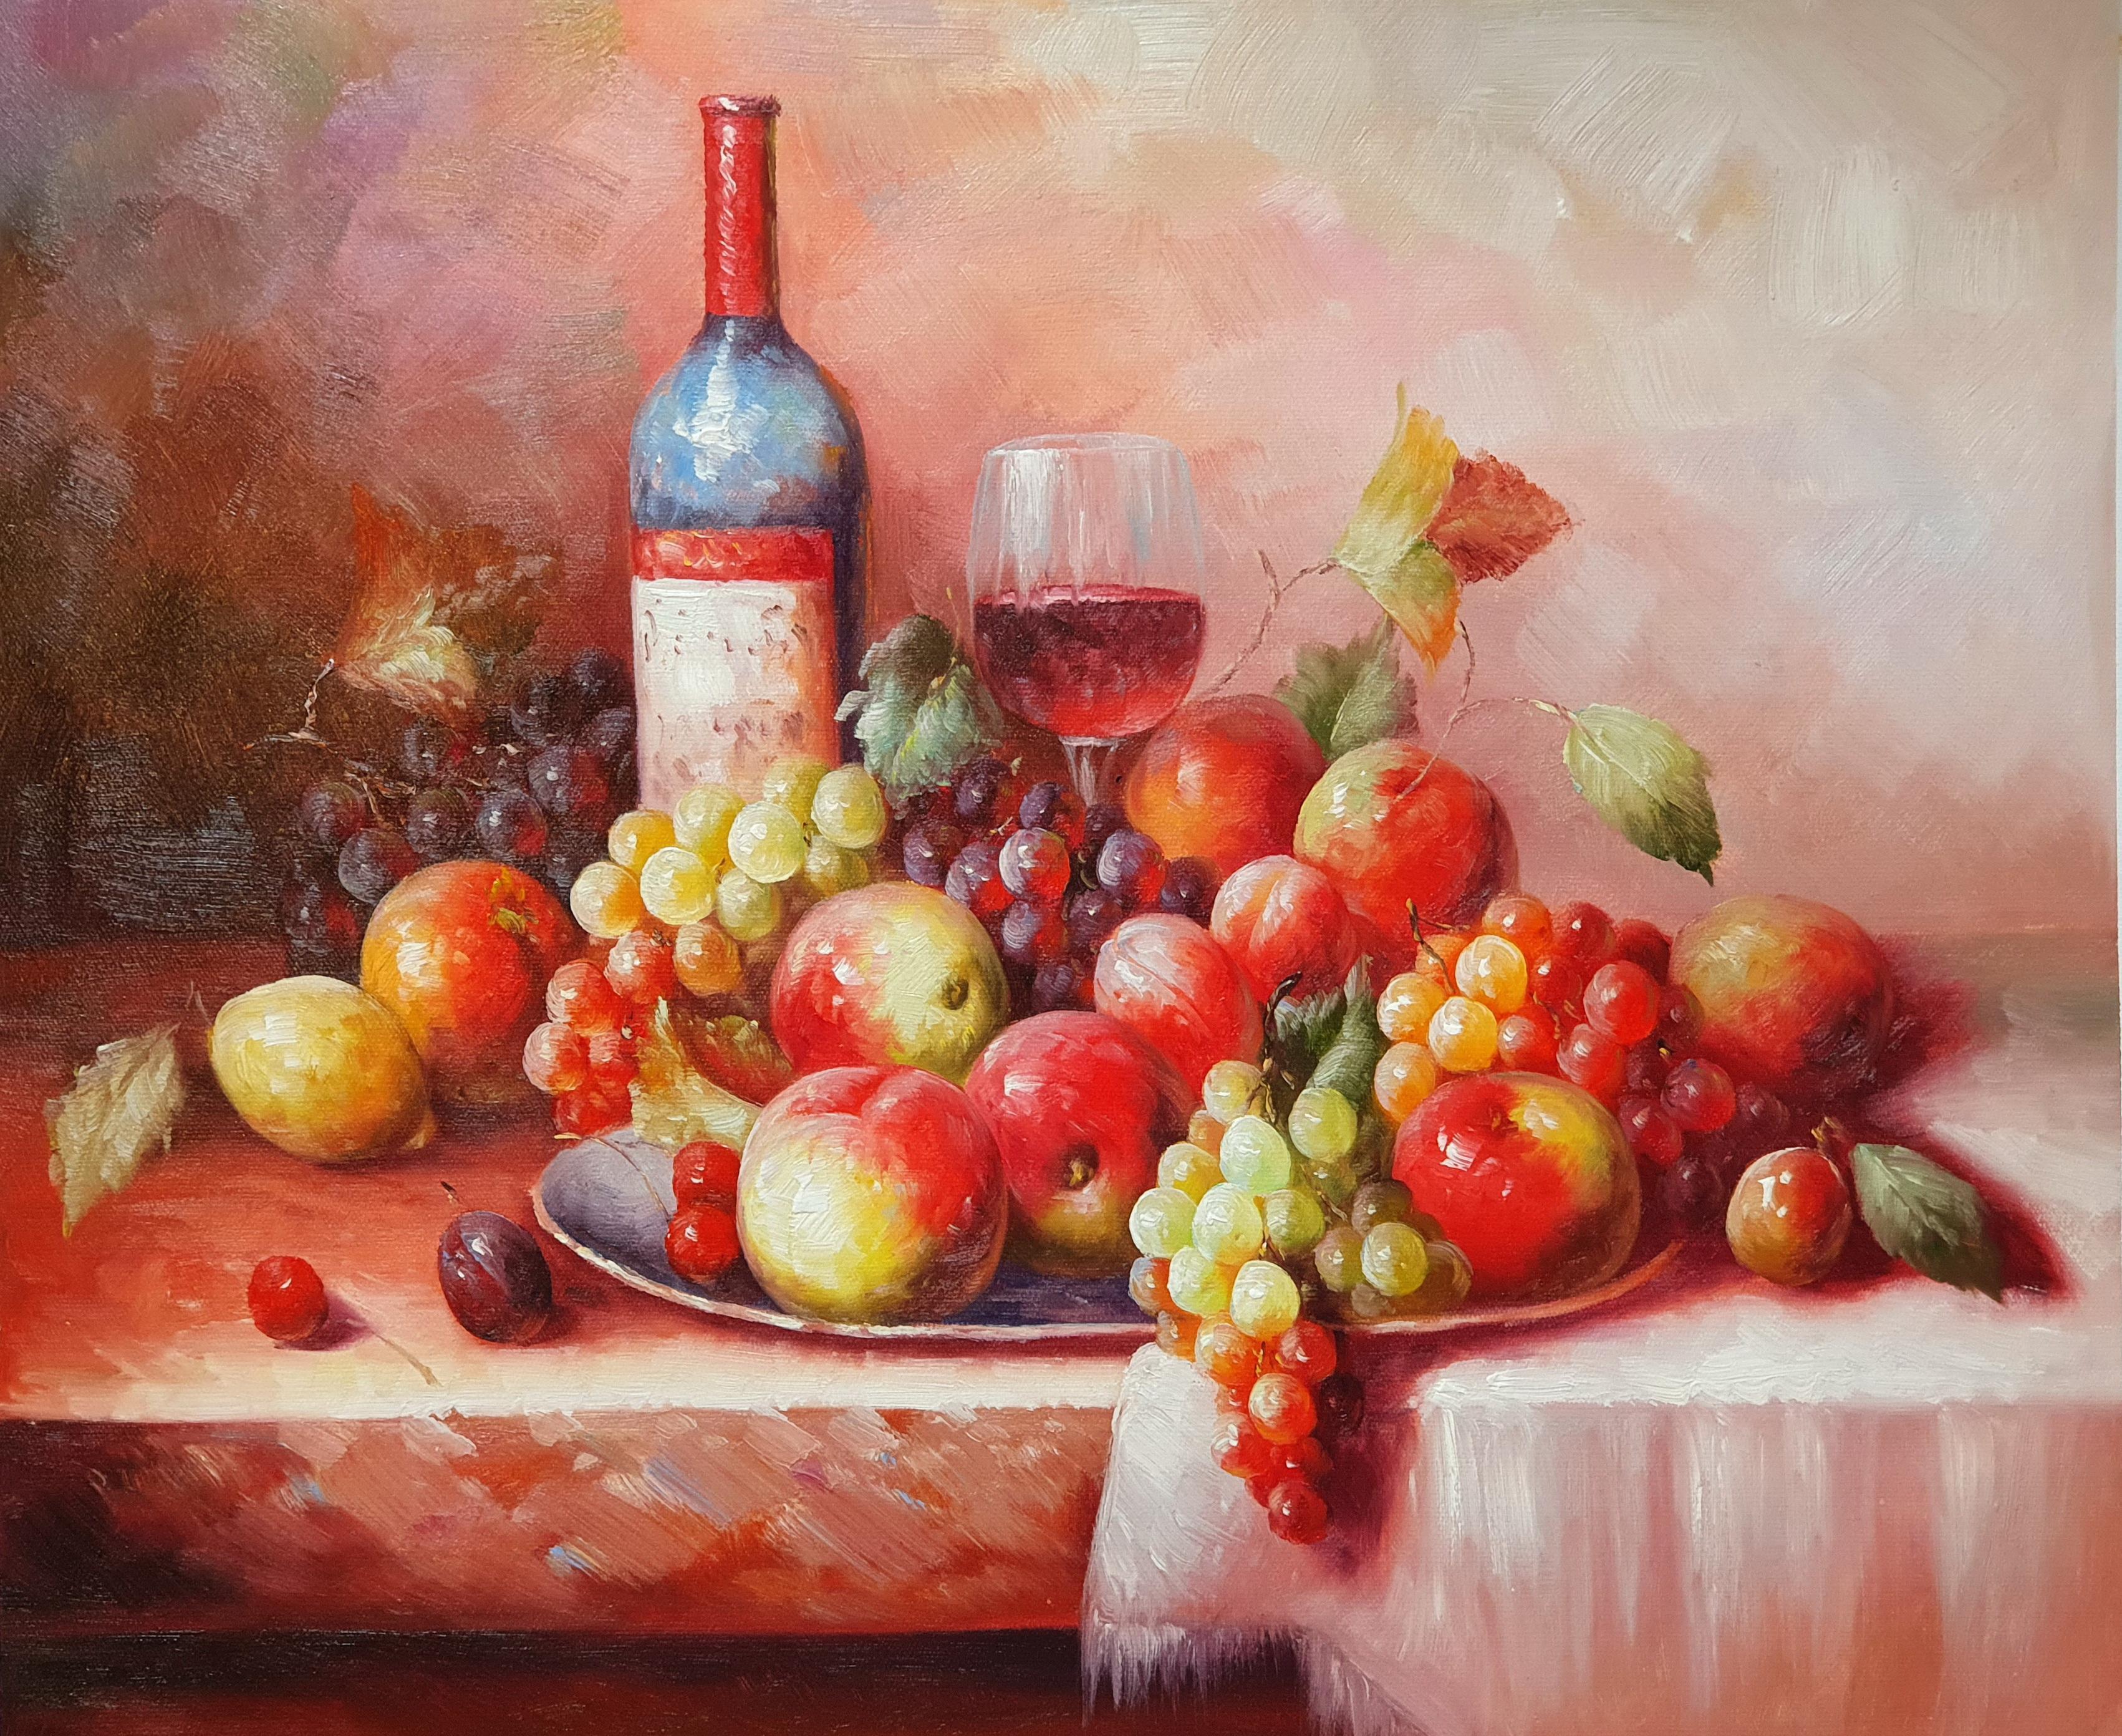 Натюрморт «Сладкое и терпкое» картина 50х60 арт. 5Ц193